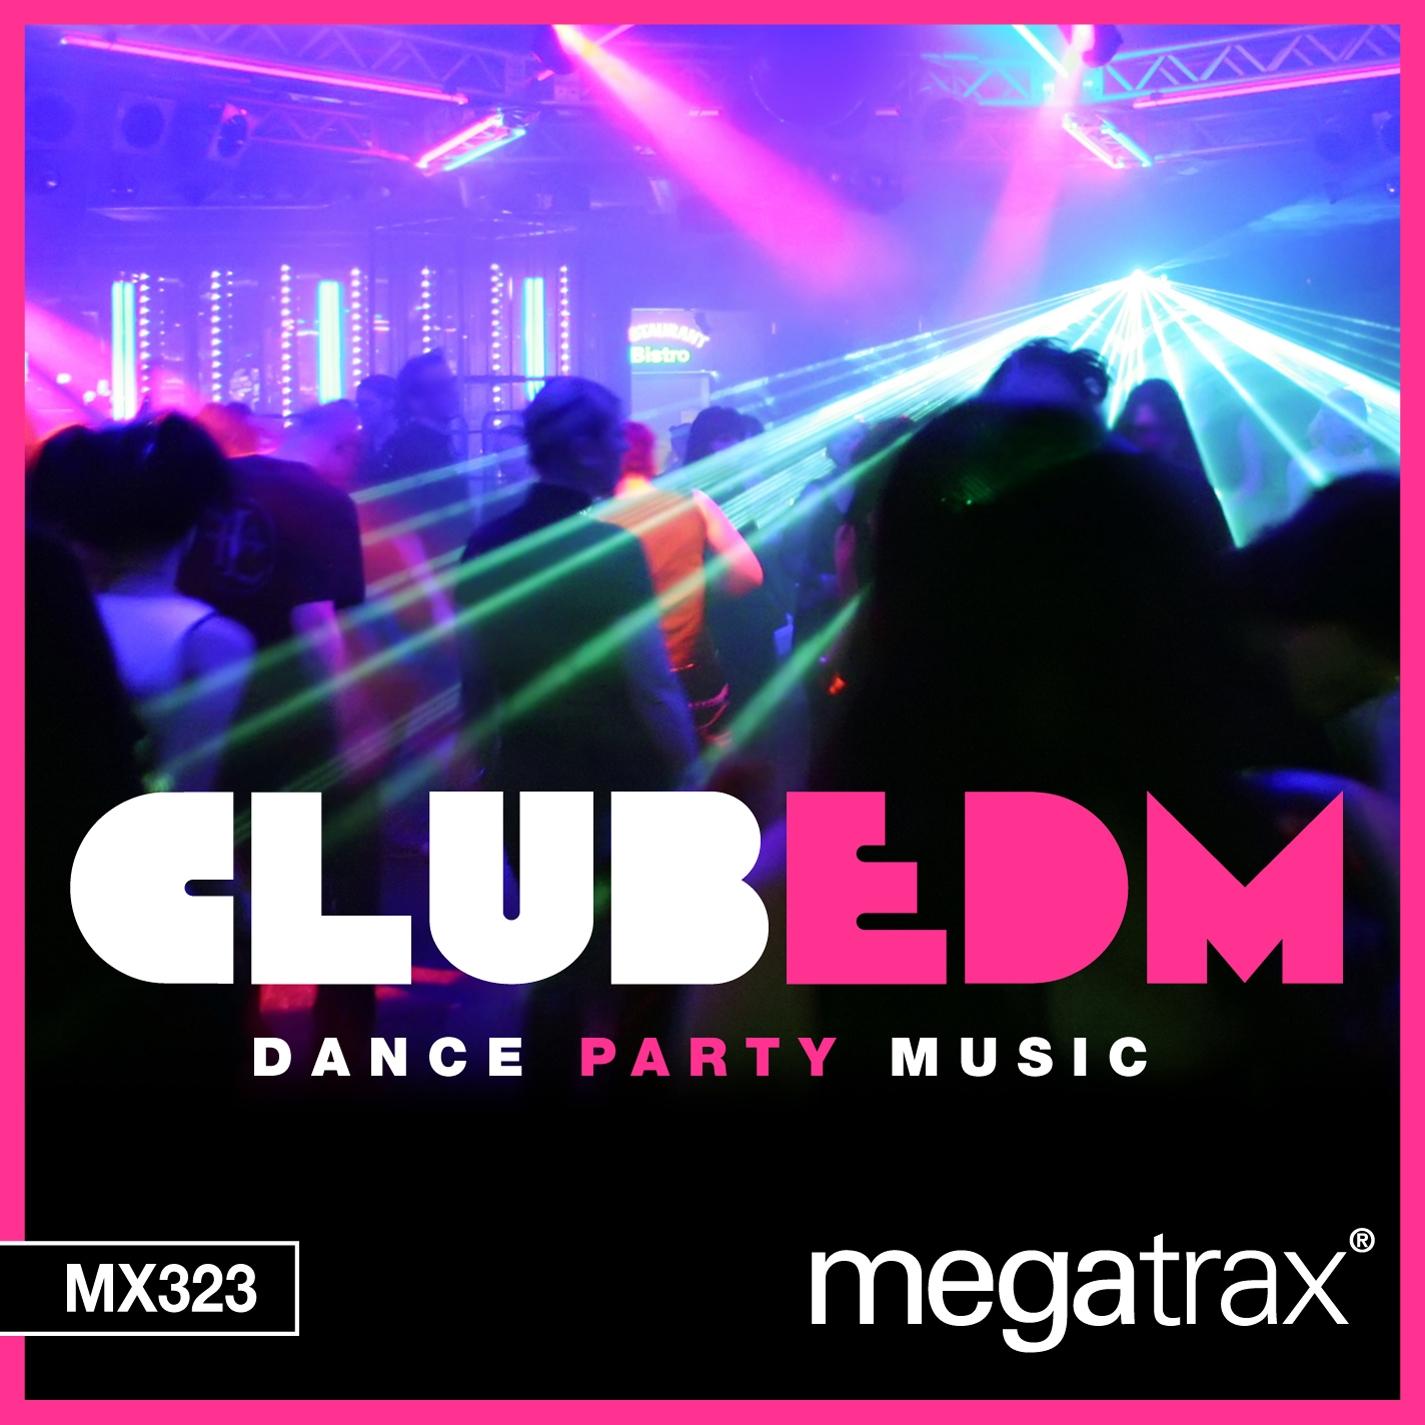 Club EDM: Dance Party Music